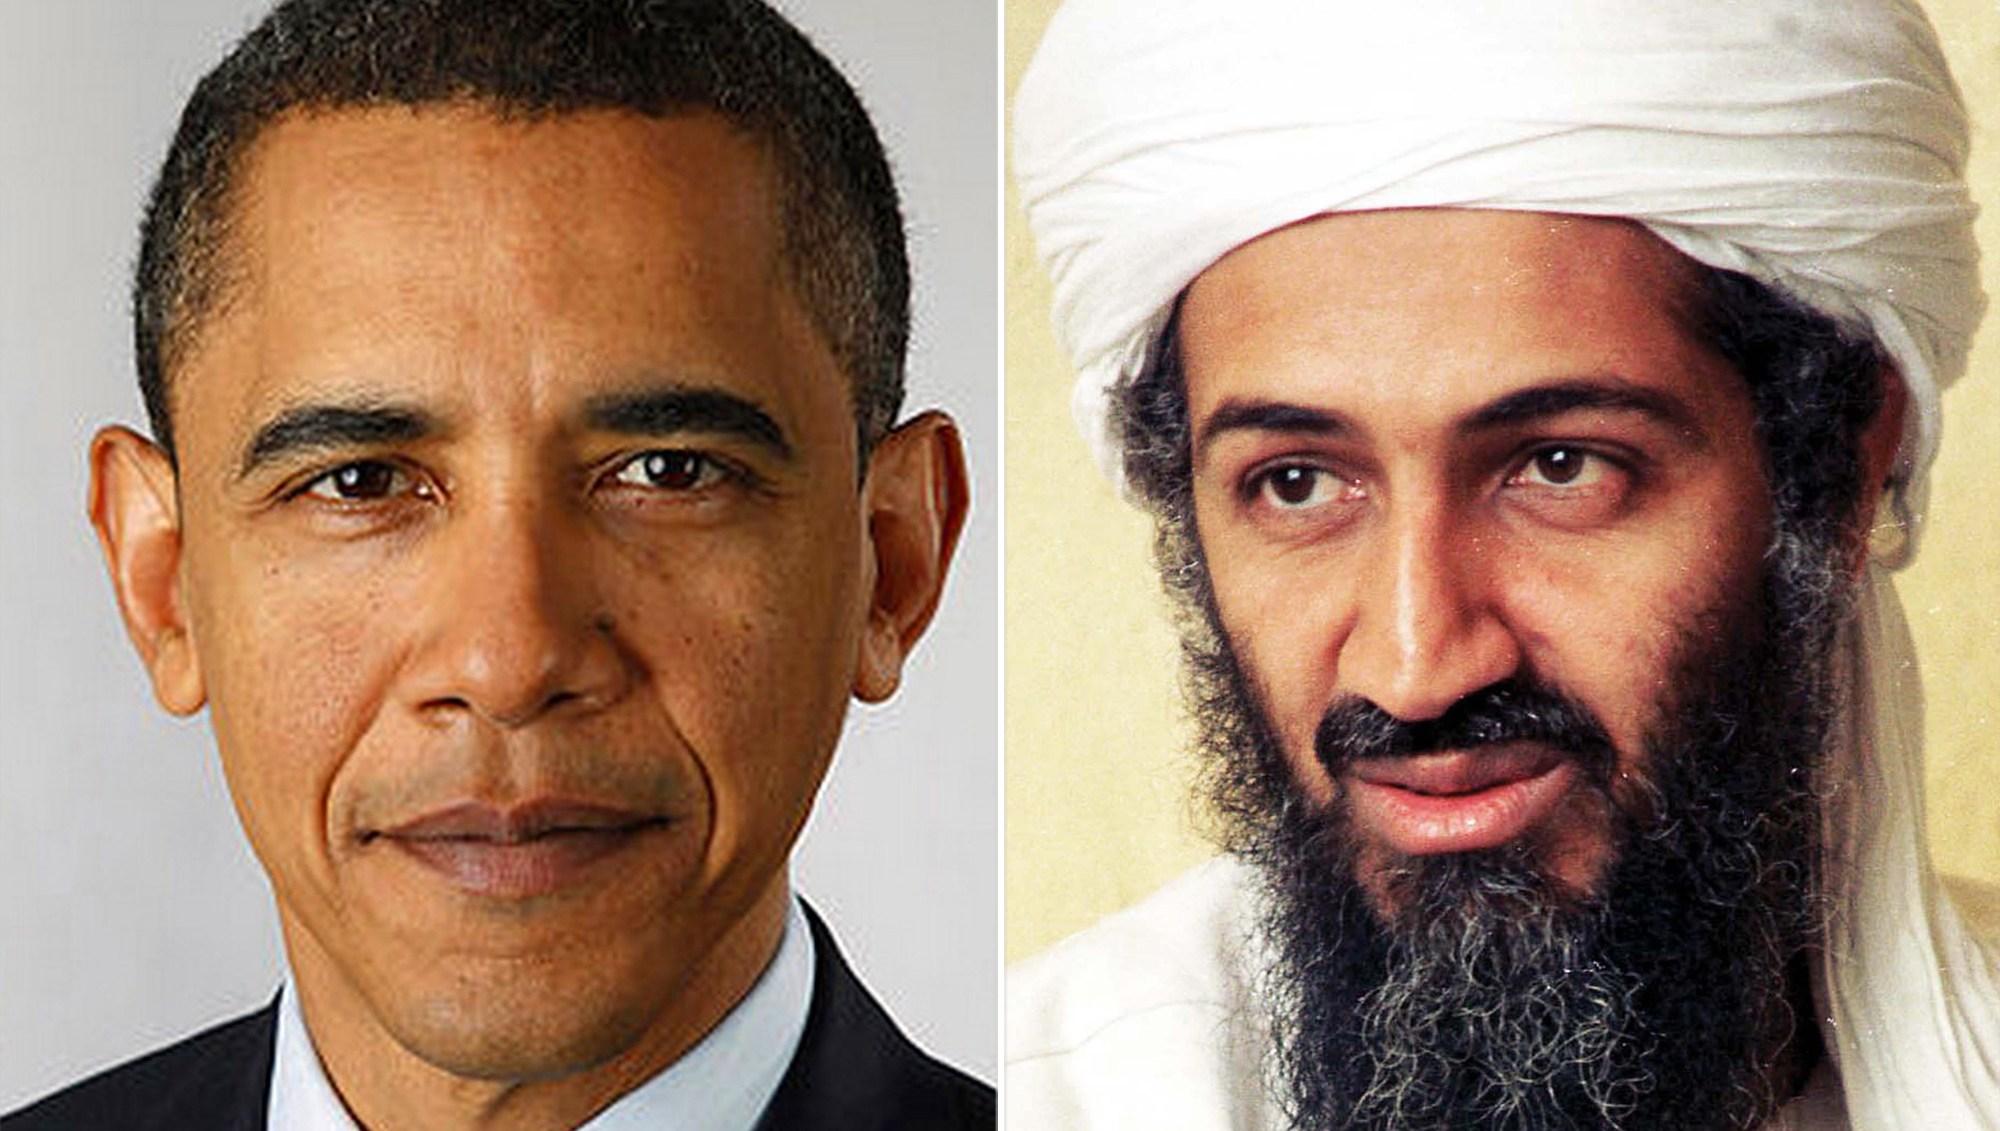 President Barack Obama, Osama bin Laden